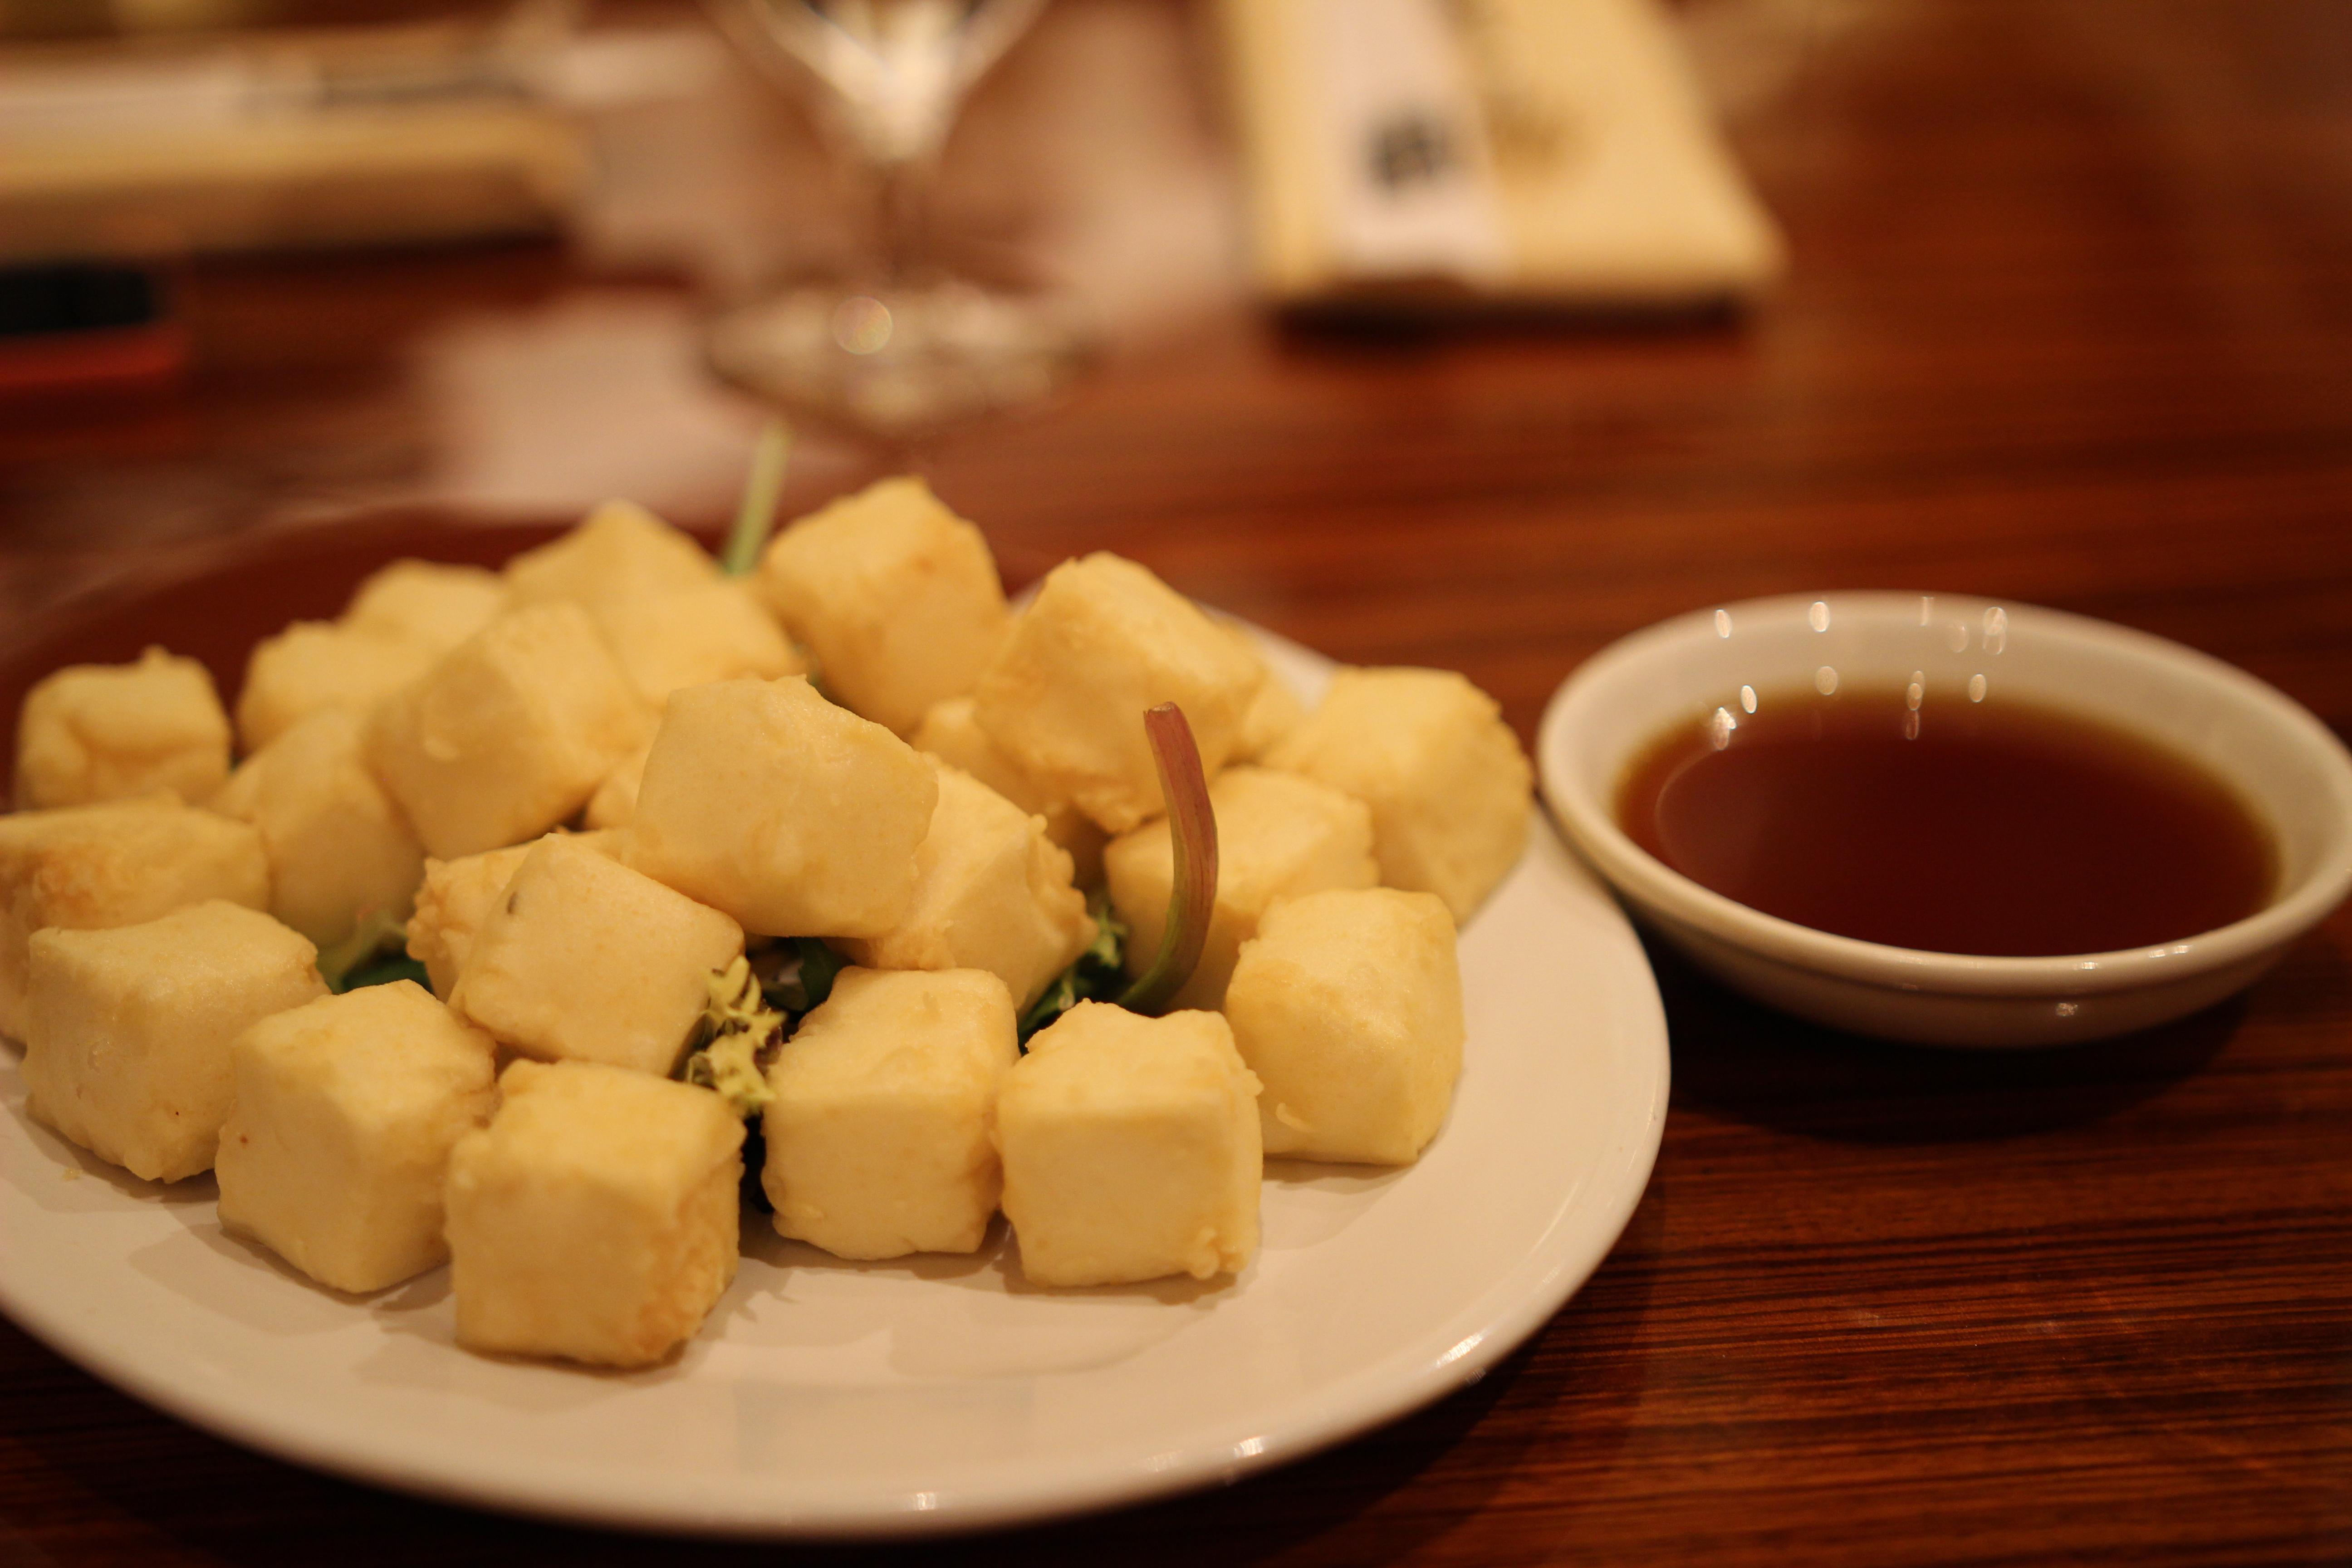 Bellagio Noodles – Agedashi Tofu